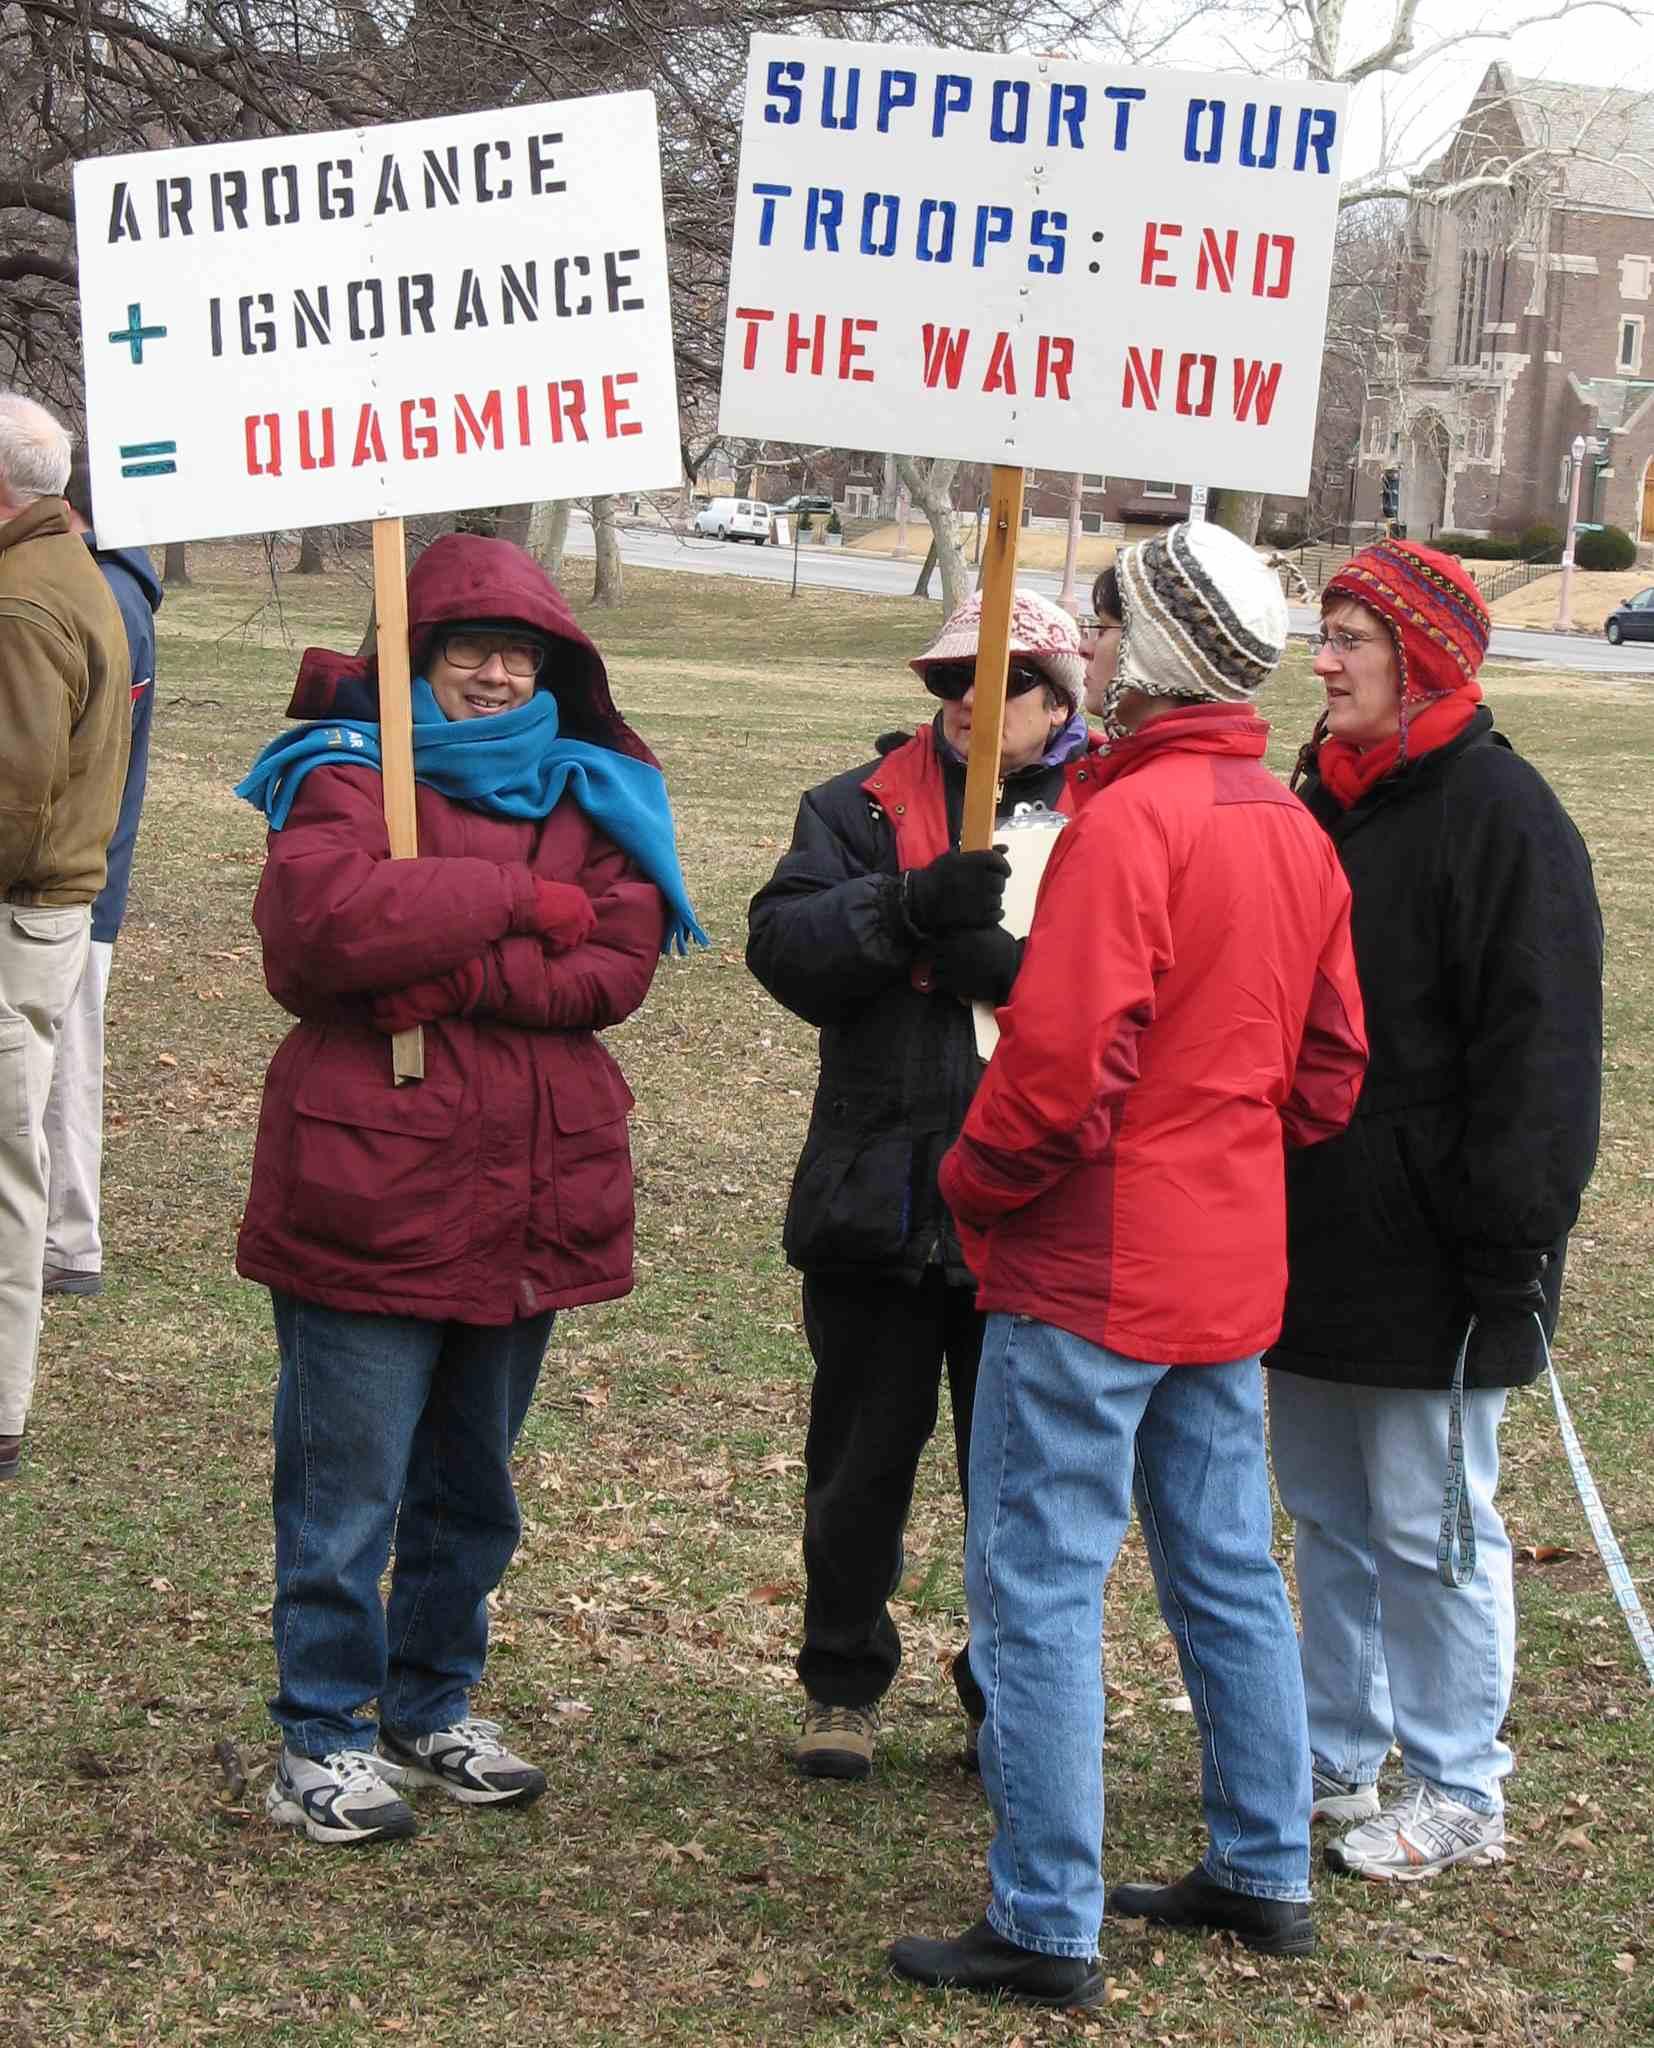 Anti-surge protest – St. Louis, Missouri